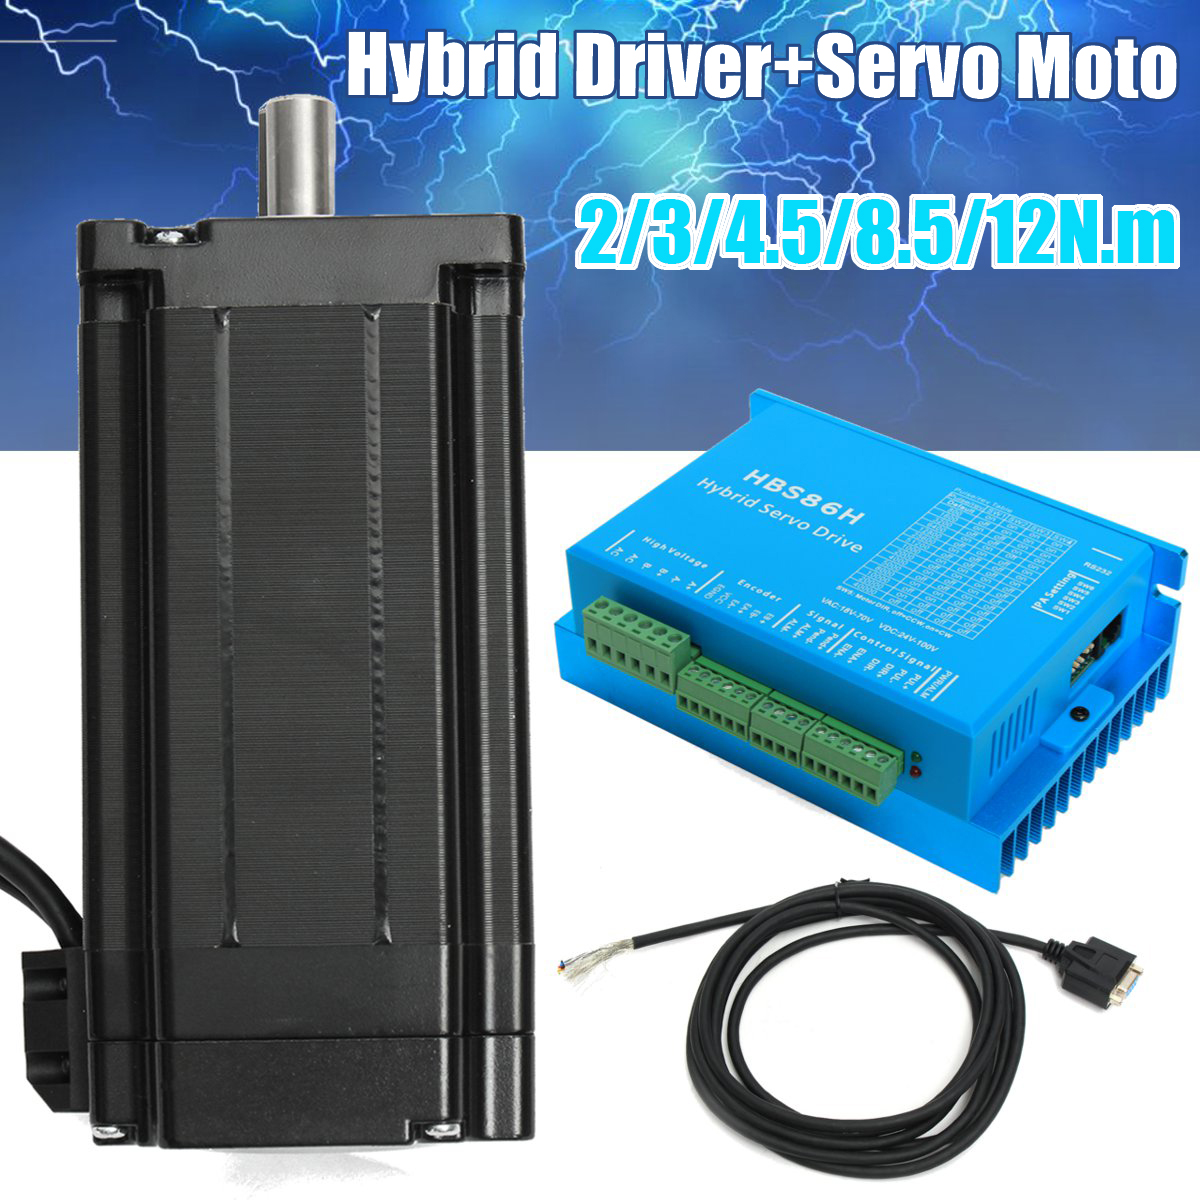 CNC HSS86 Hybrid Driver+ Servo Motor Nema34 12N.m Closed Loop